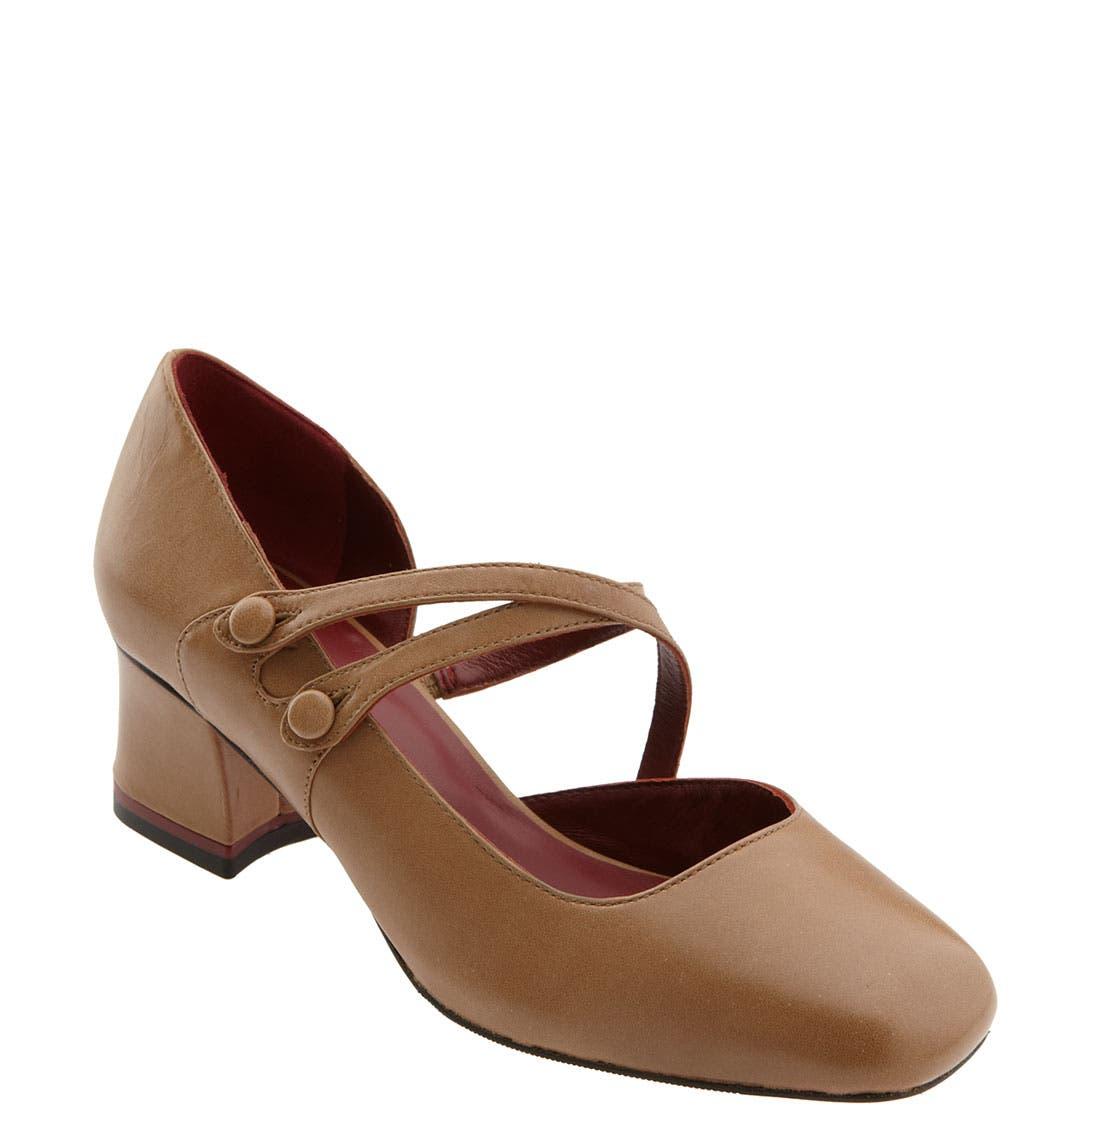 Main Image - Oh! Shoes 'Melany' Mary Jane